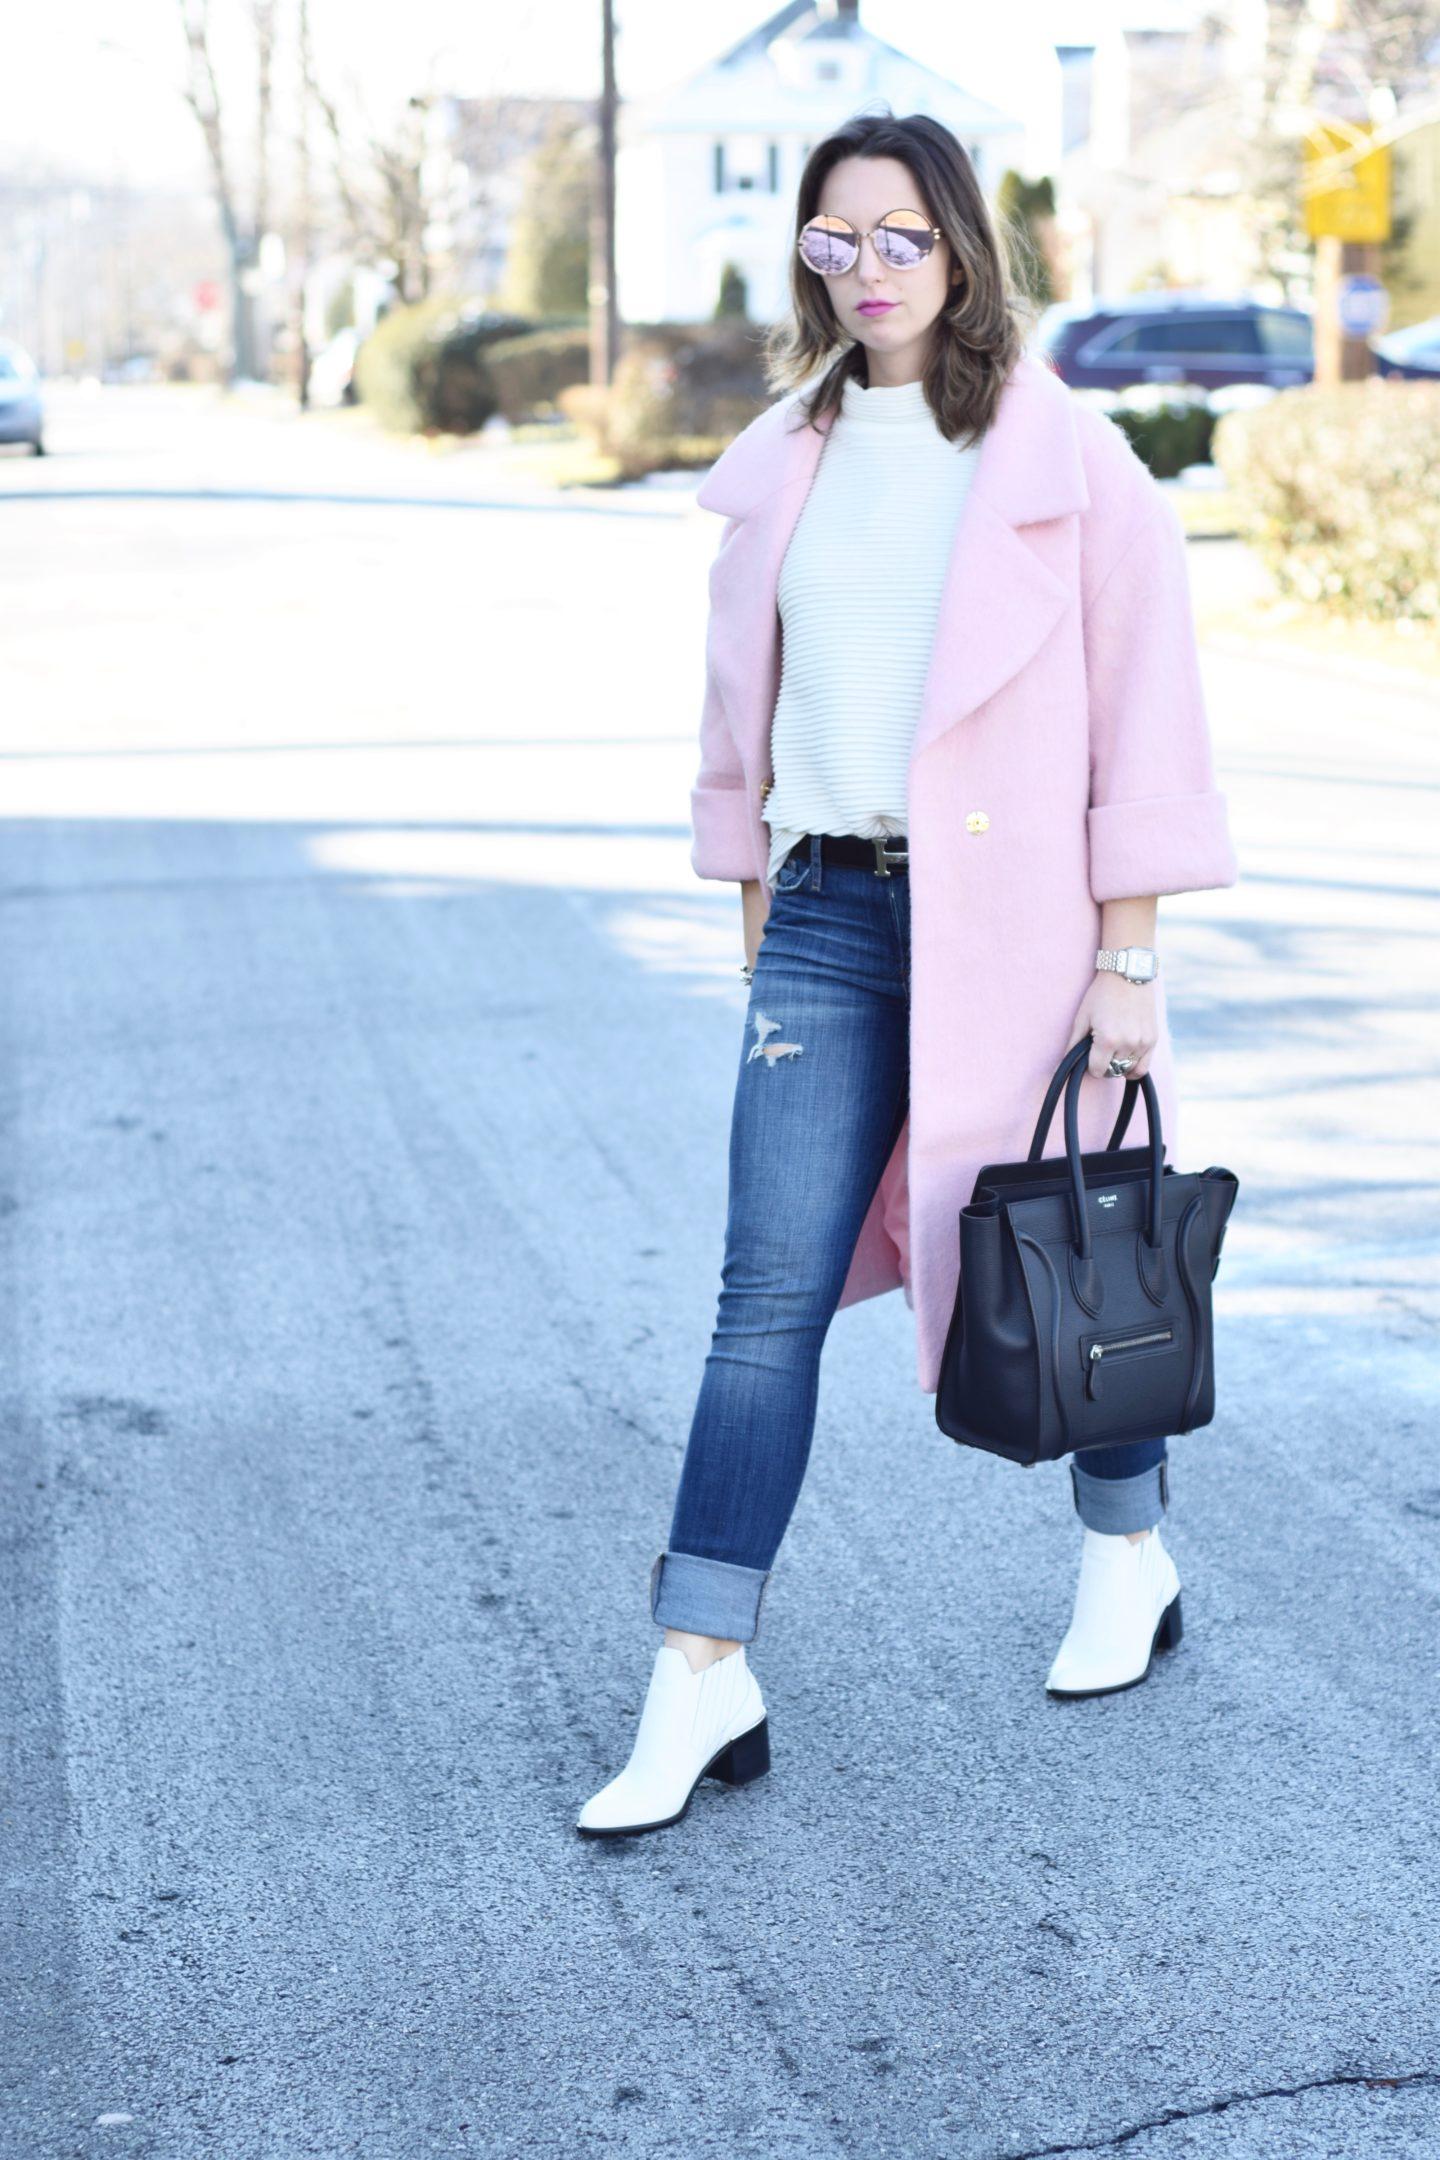 wearing color- hm pink coat-blogger